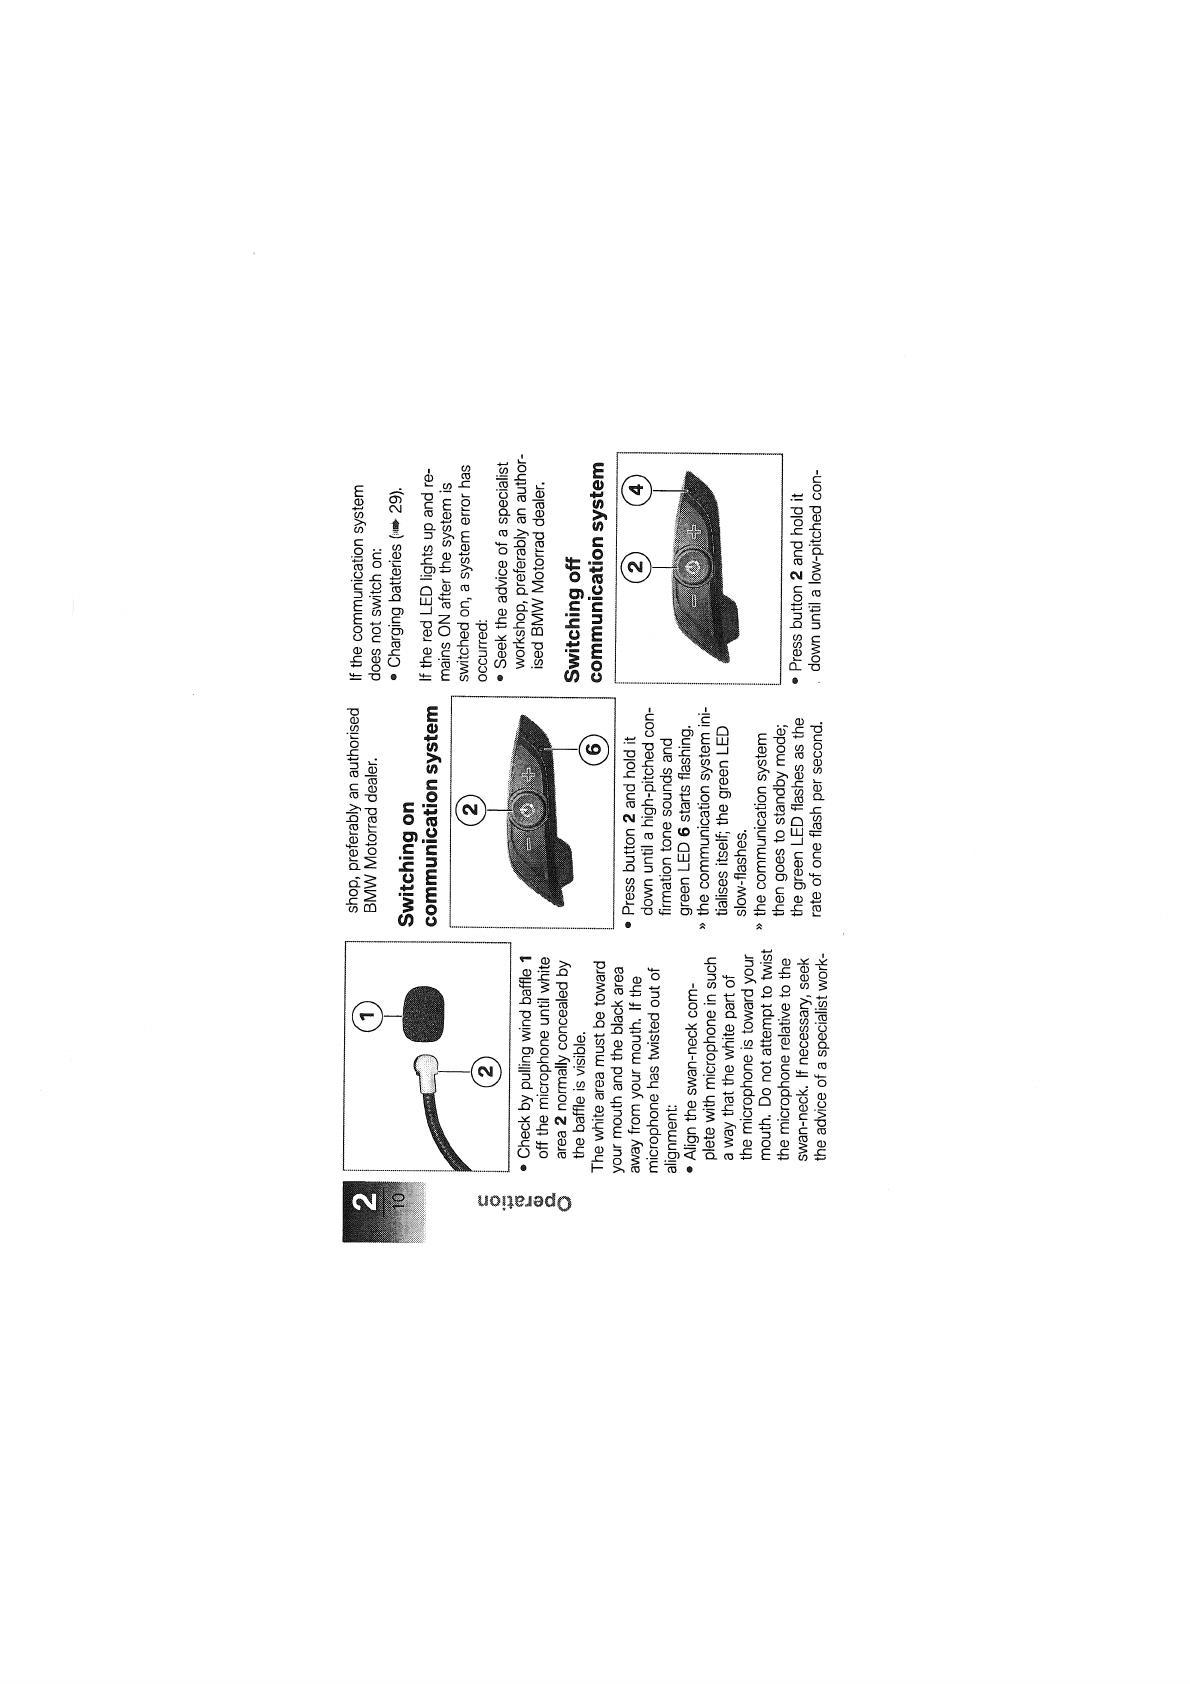 Bmw Motorrad Audio System Manual